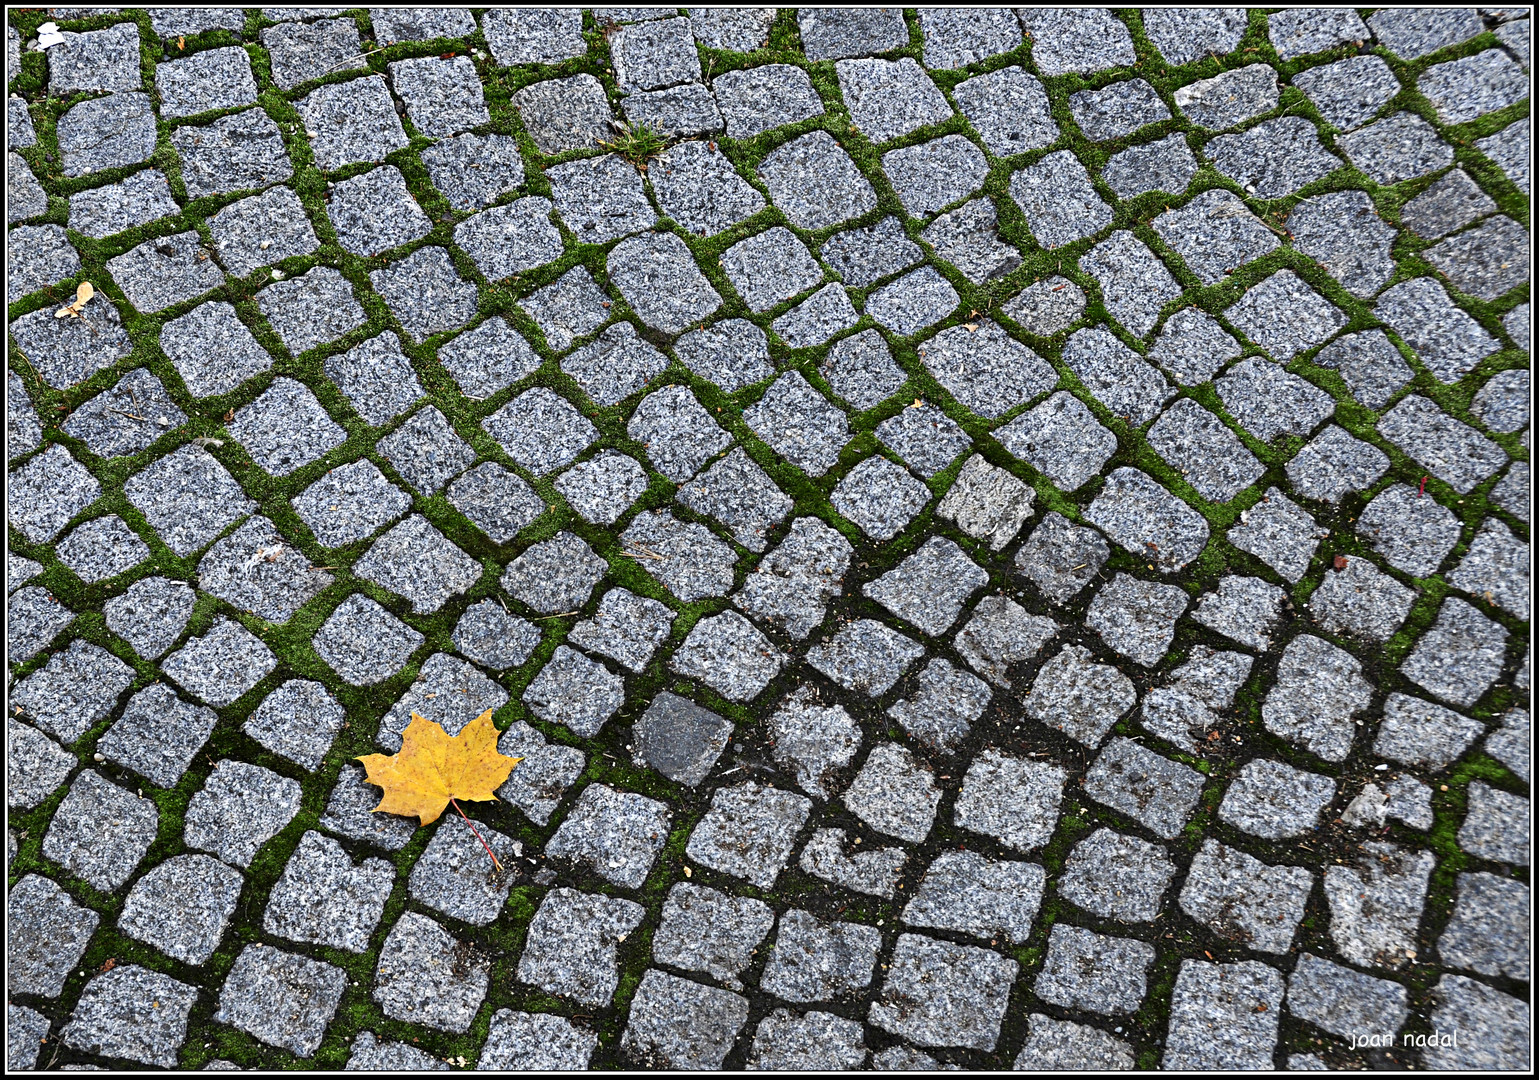 Se aproxima el otoño